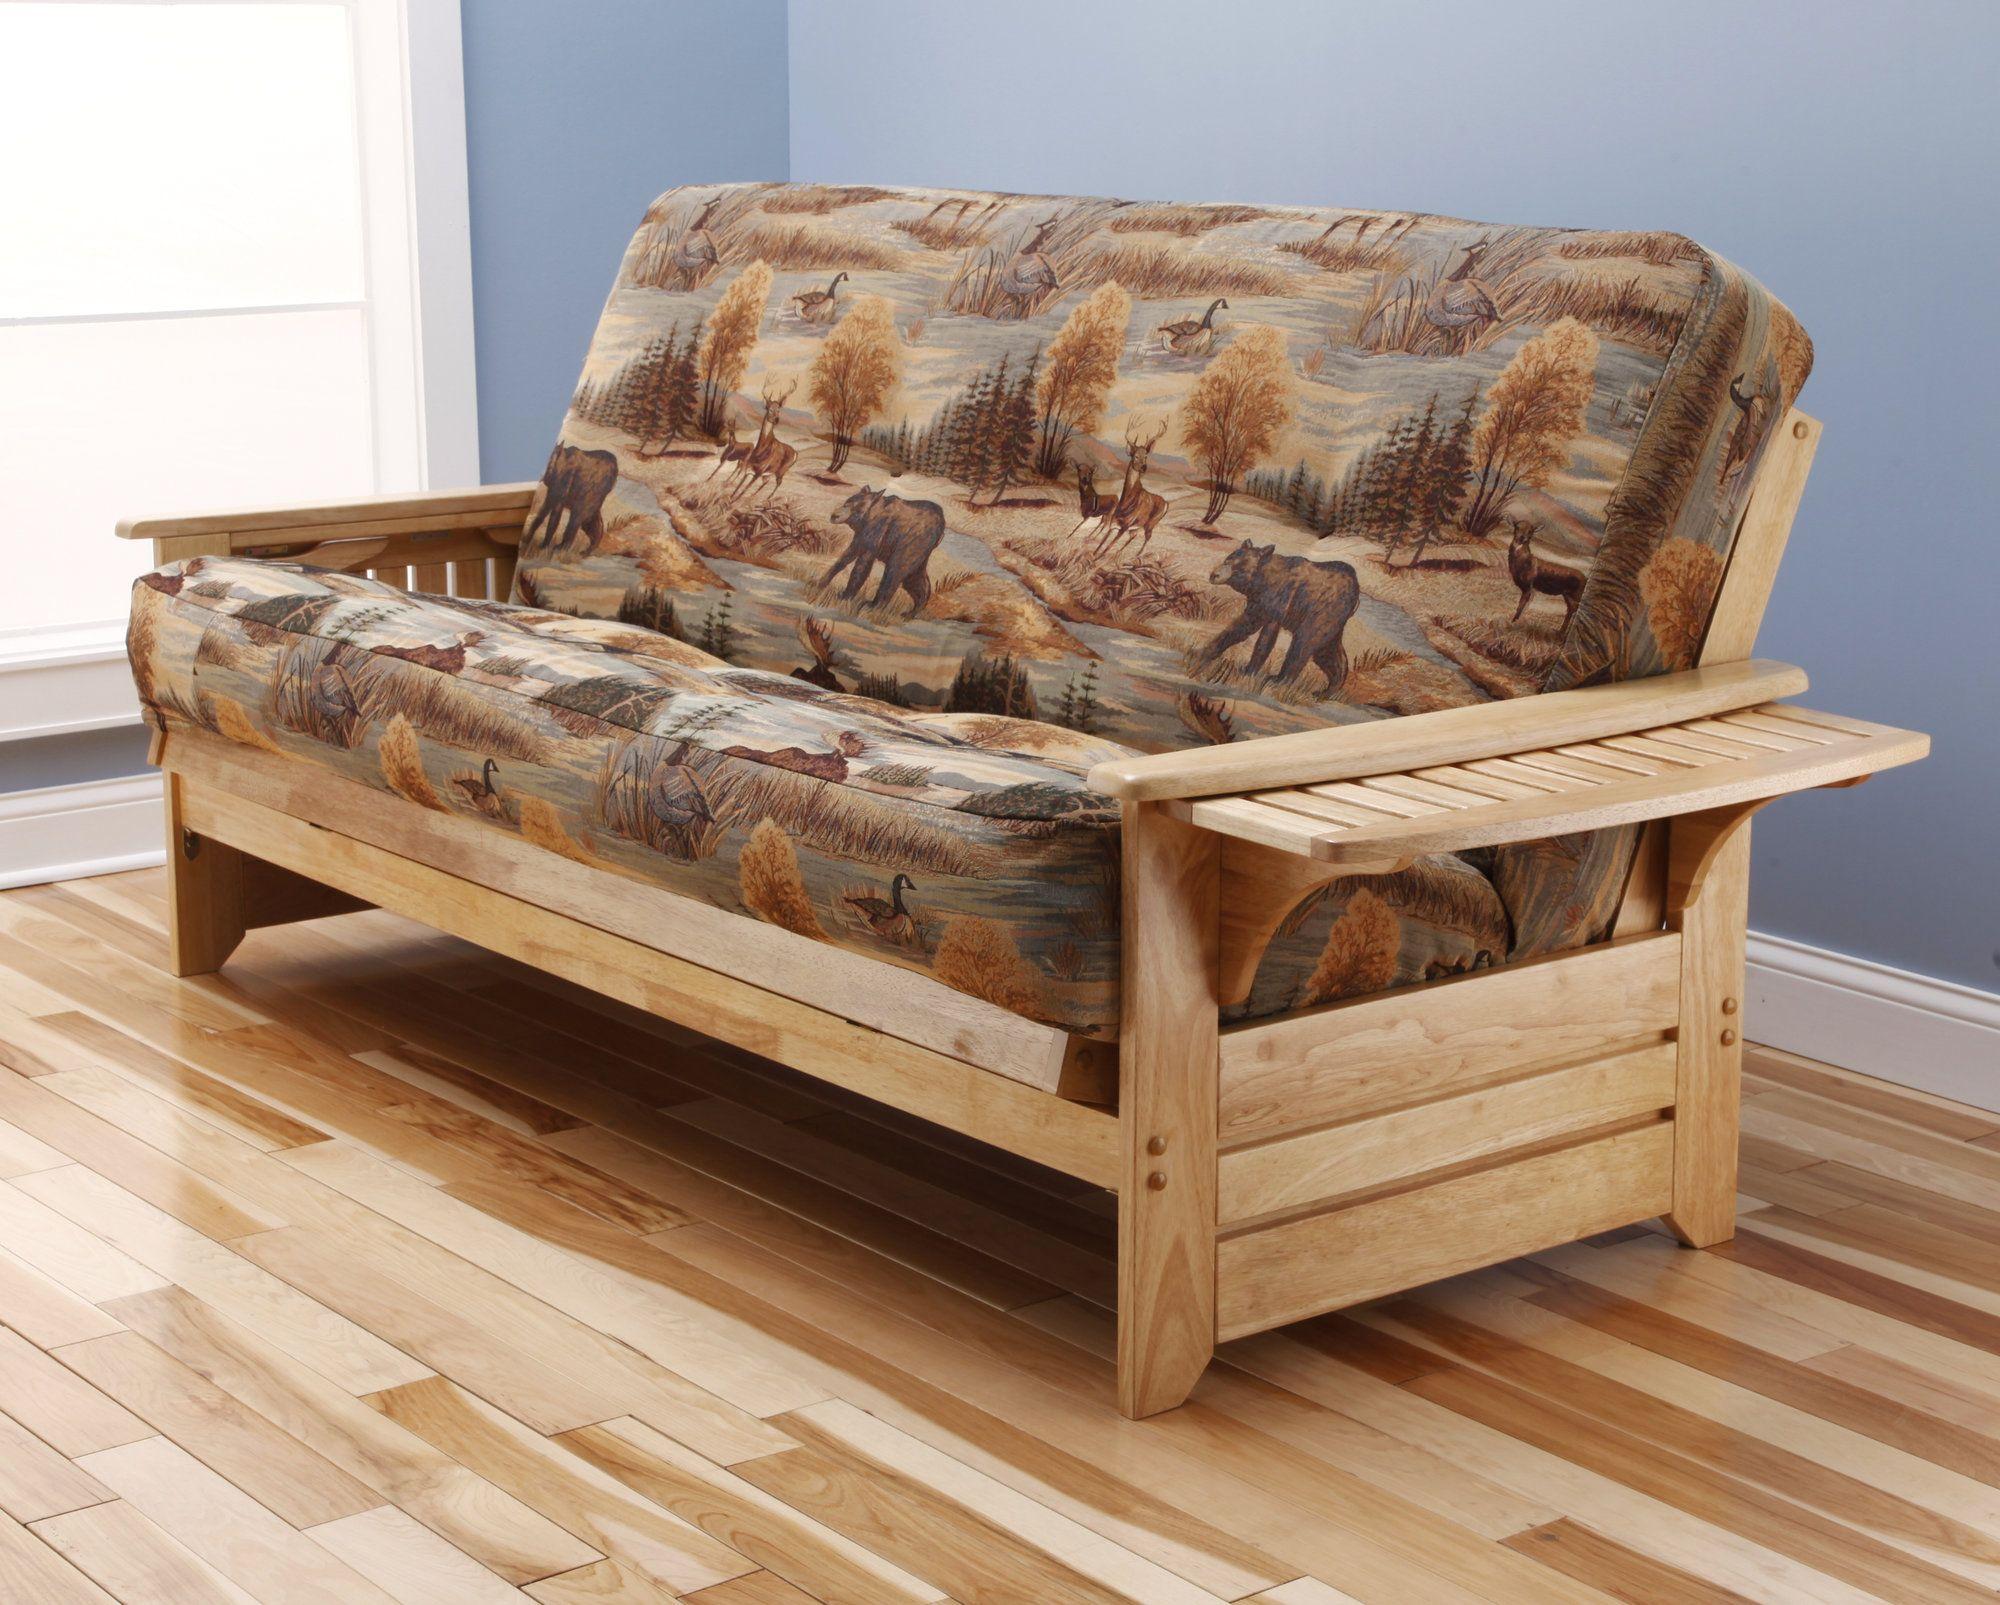 Kodiak Furniture Phoenix Canadian Storage Drawers Futon And Mattress As Shown